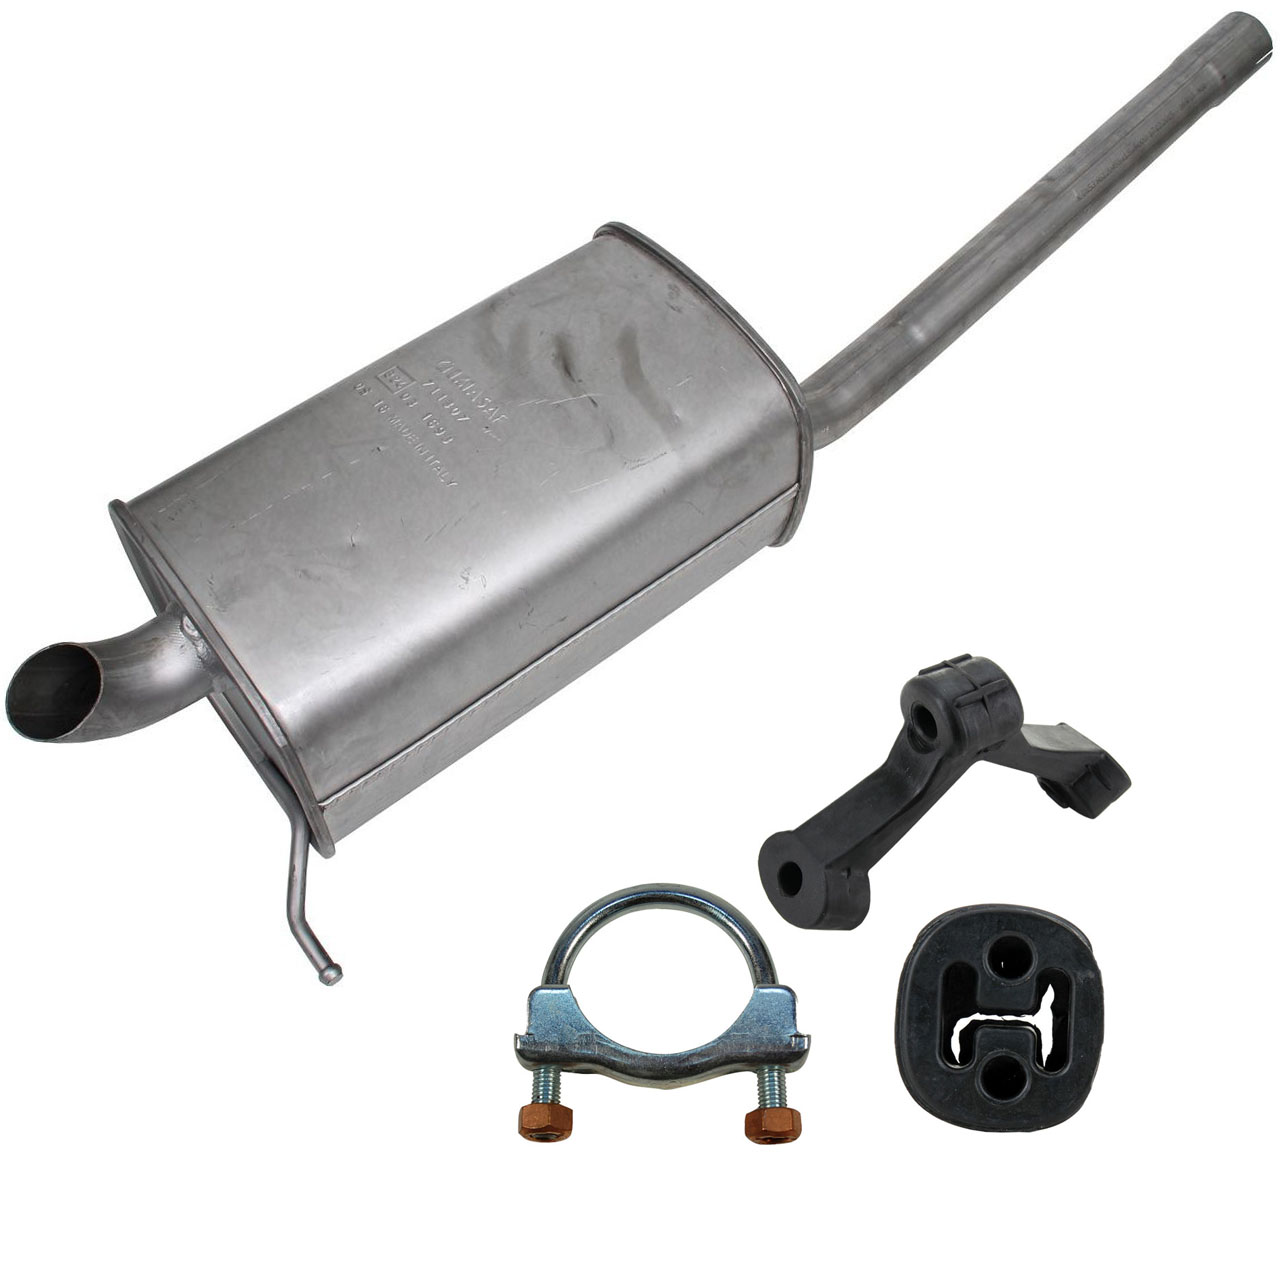 IMASAF Endschalldämpfer + Anbausatz VW Caddy 3 1.6 TDI + 2.0 TDI 75-170 PS